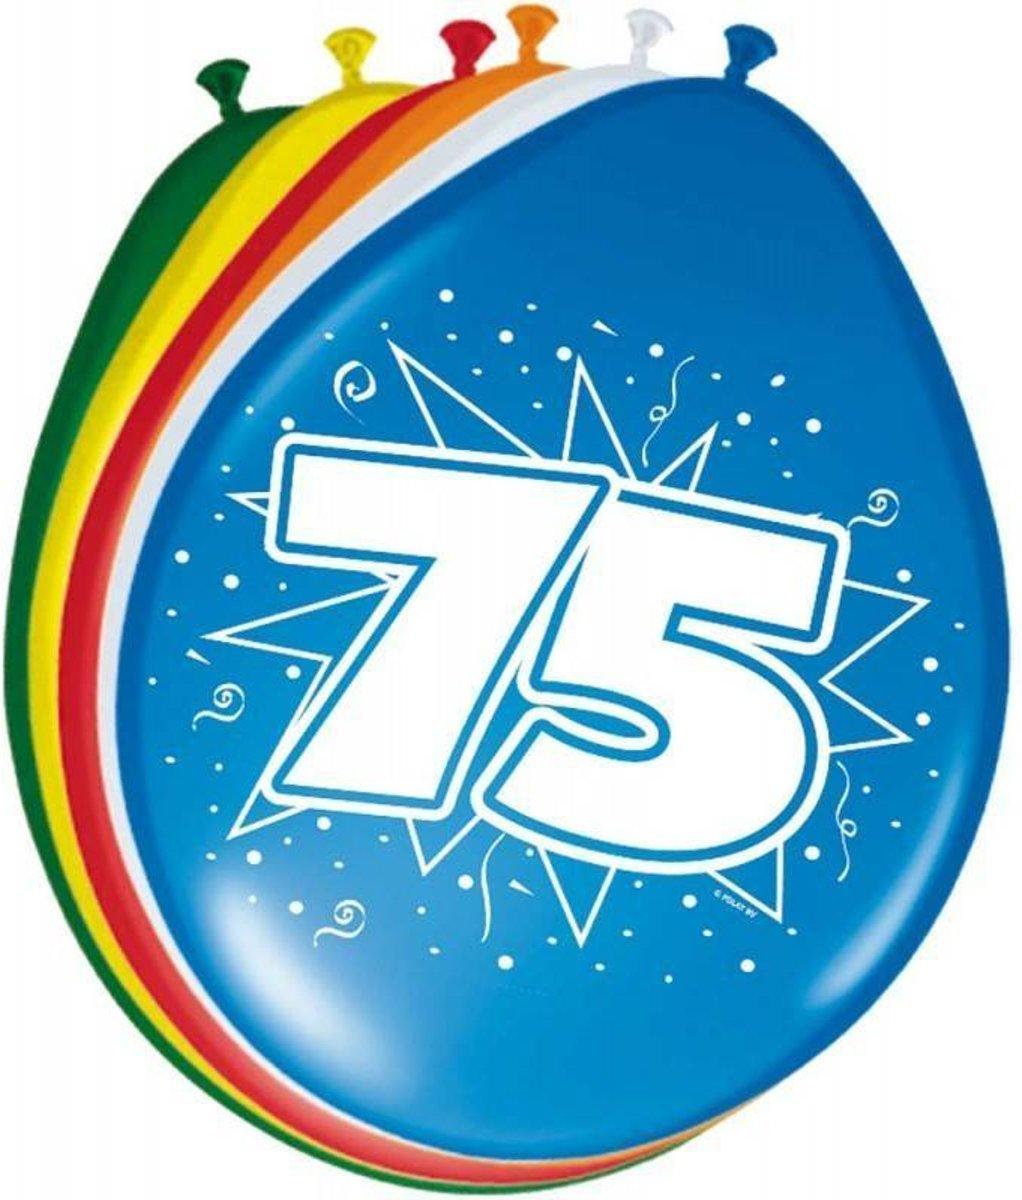 75 Jaar Ballonnen 30cm 8 stuks